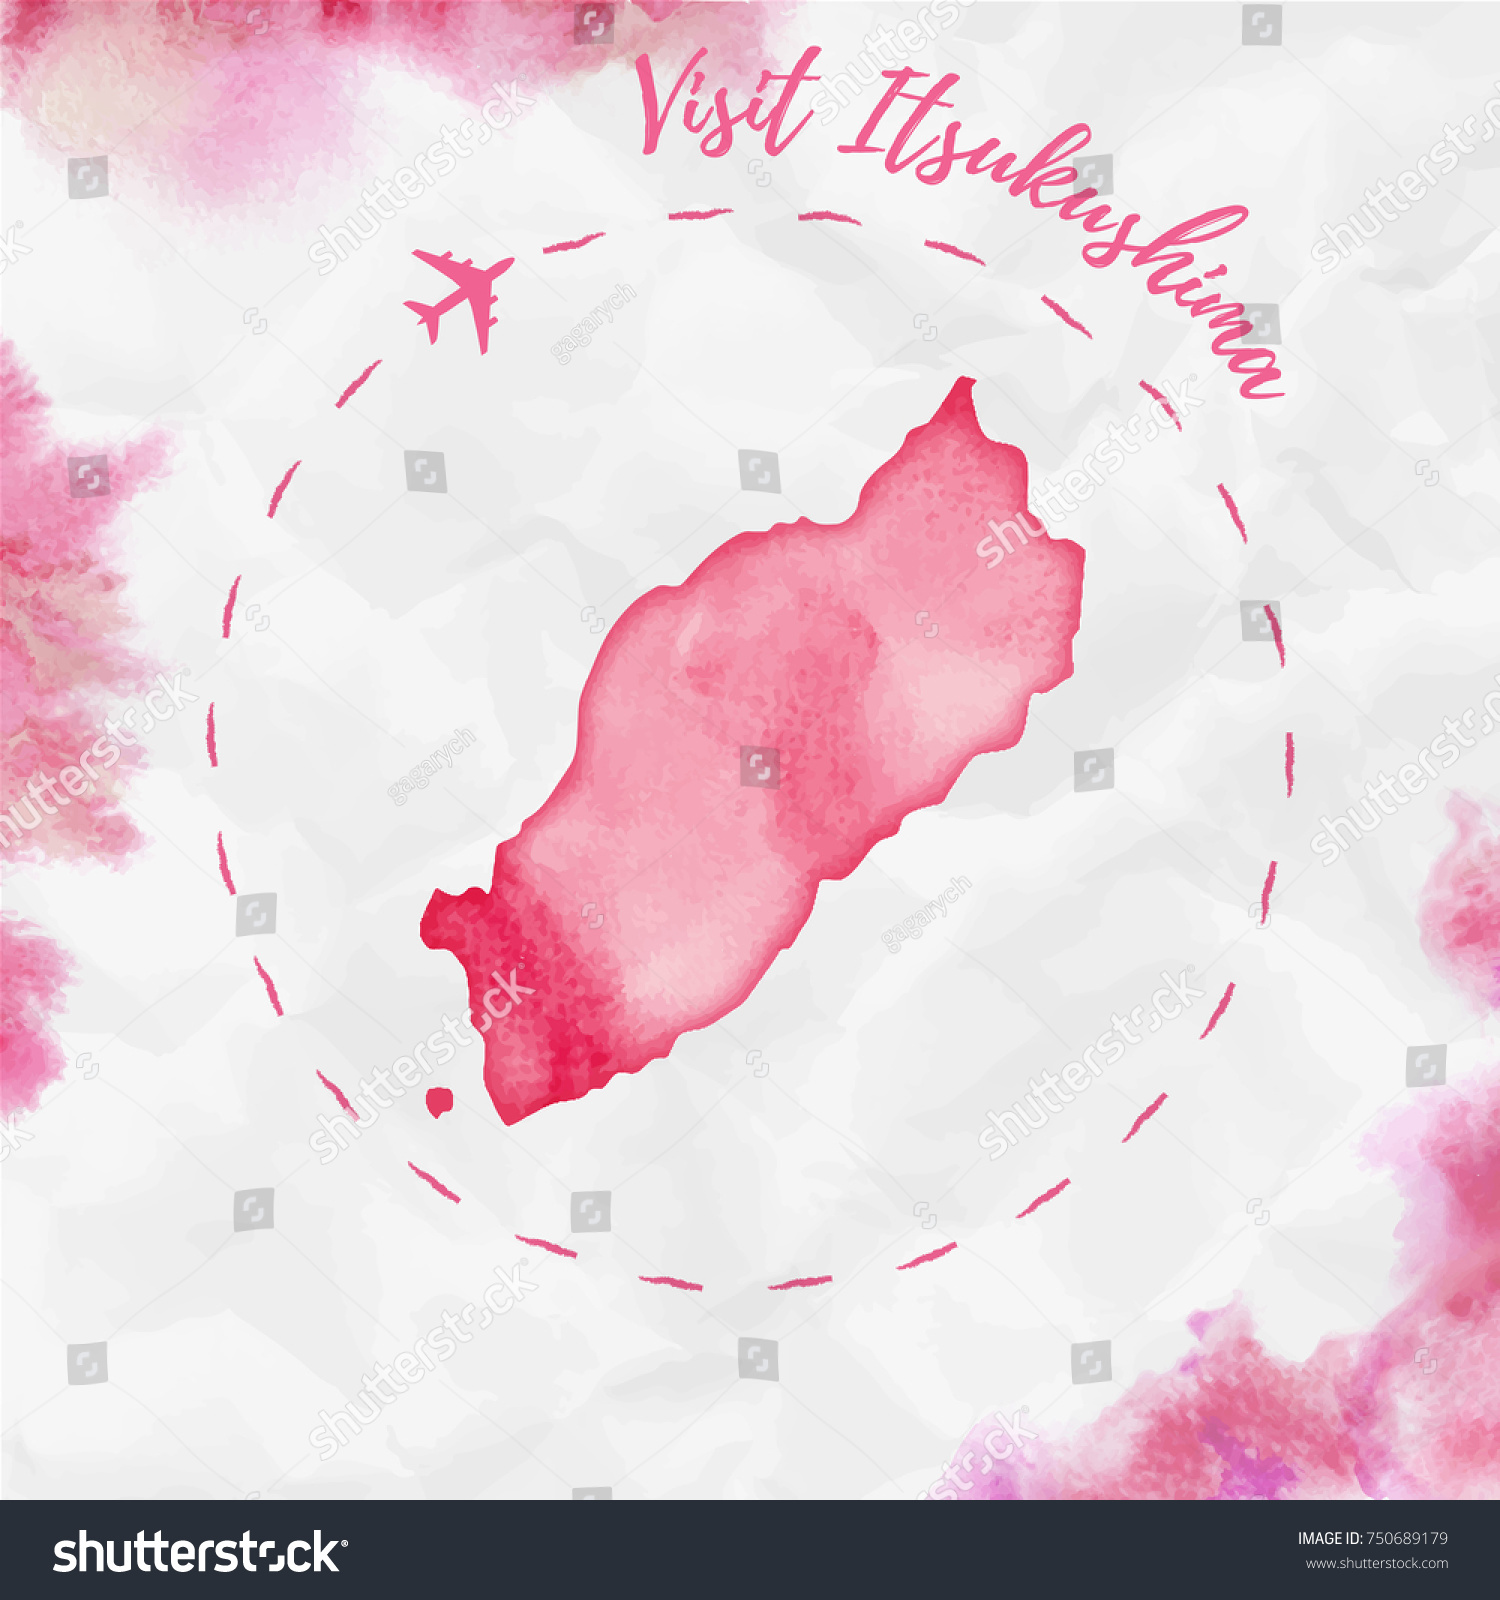 Itsukushima Watercolor Island Map Red Colors Stock Vector 750689179